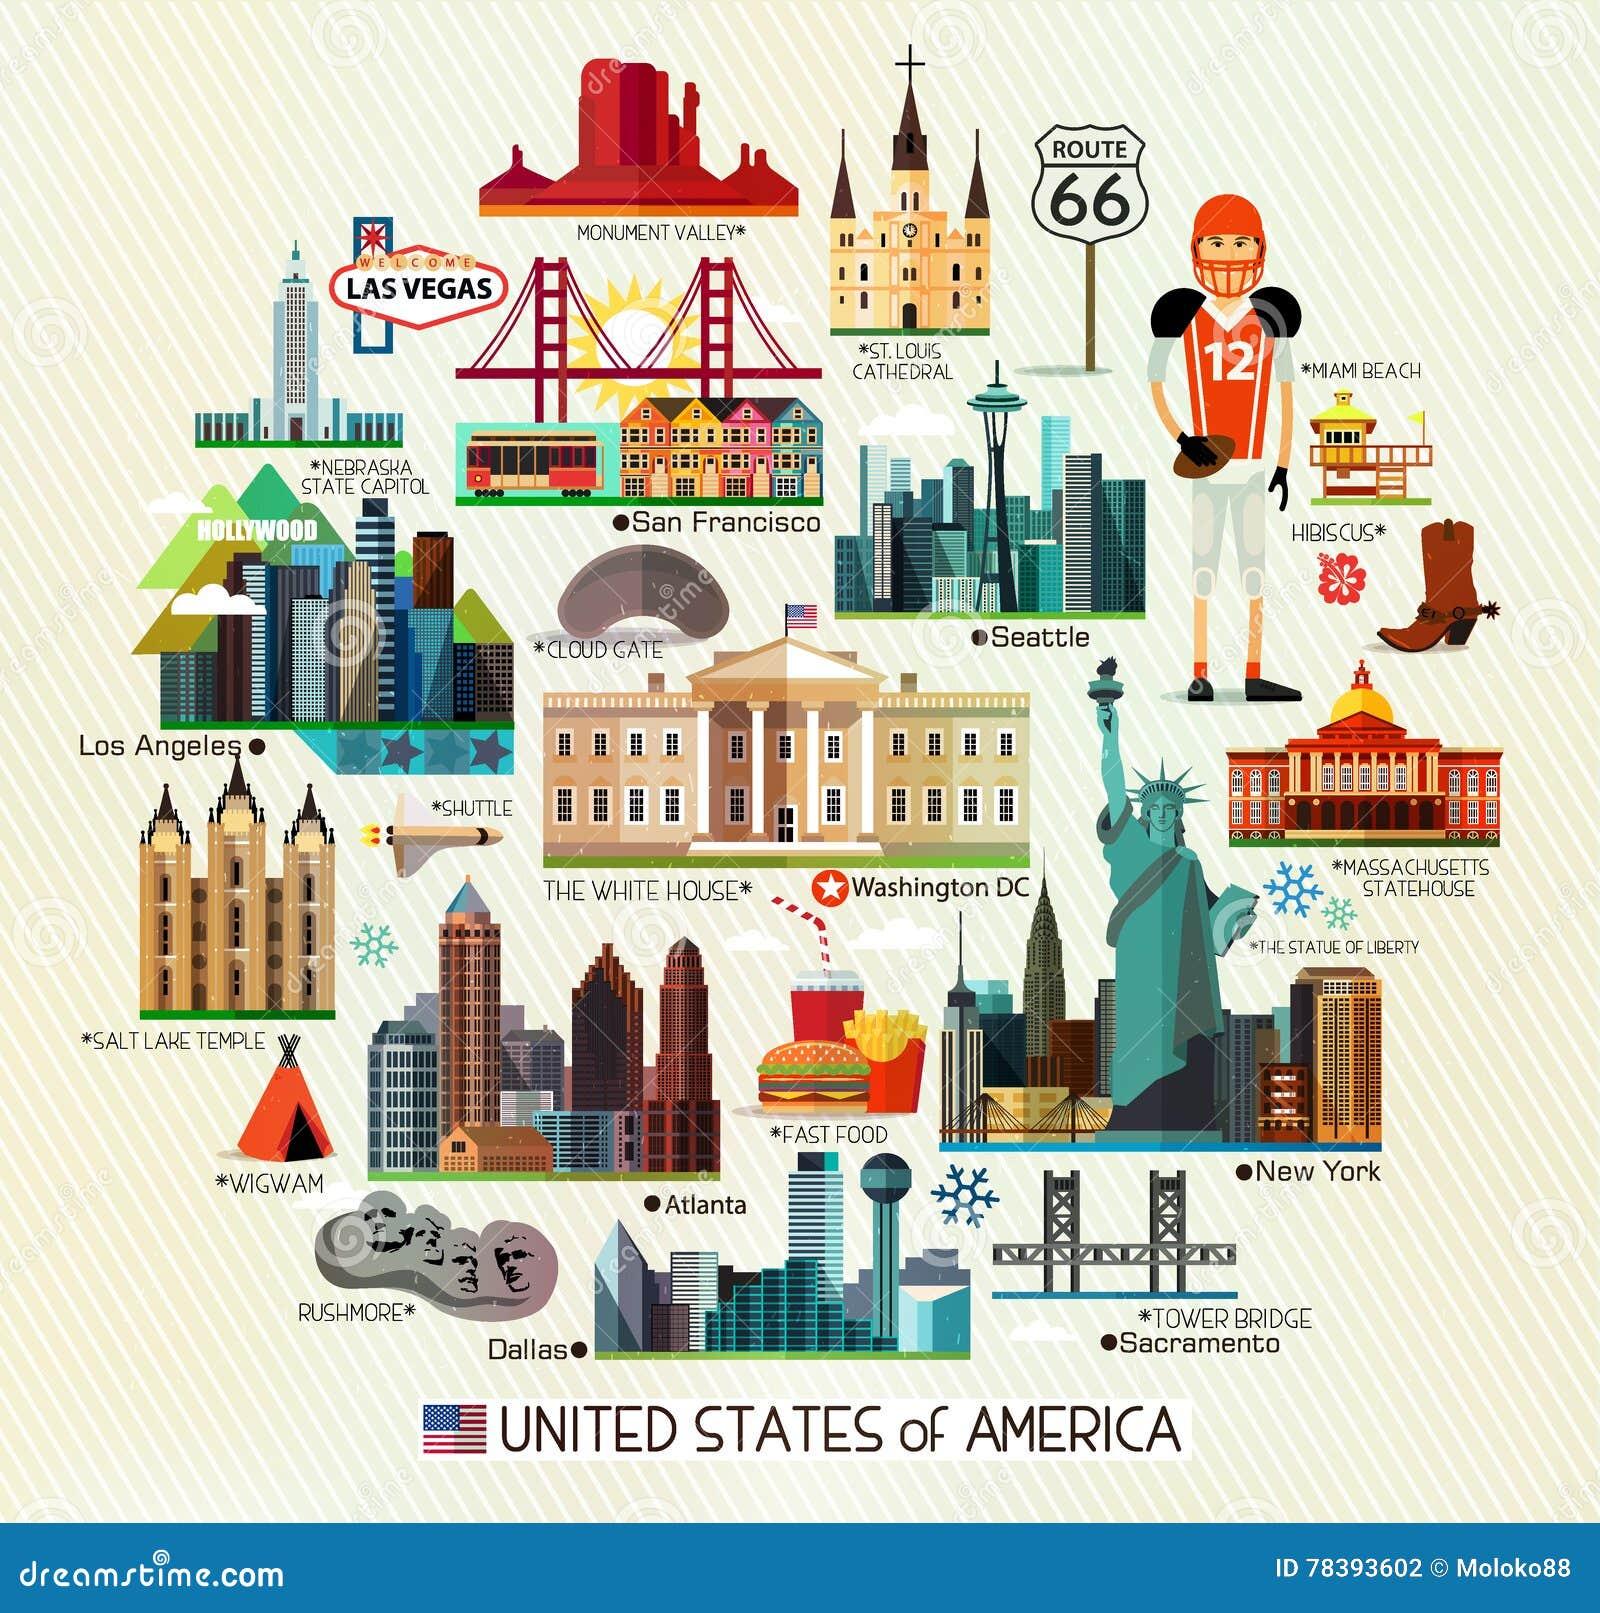 Usa Travel Map  Stock Vector  Illustration Of Beach